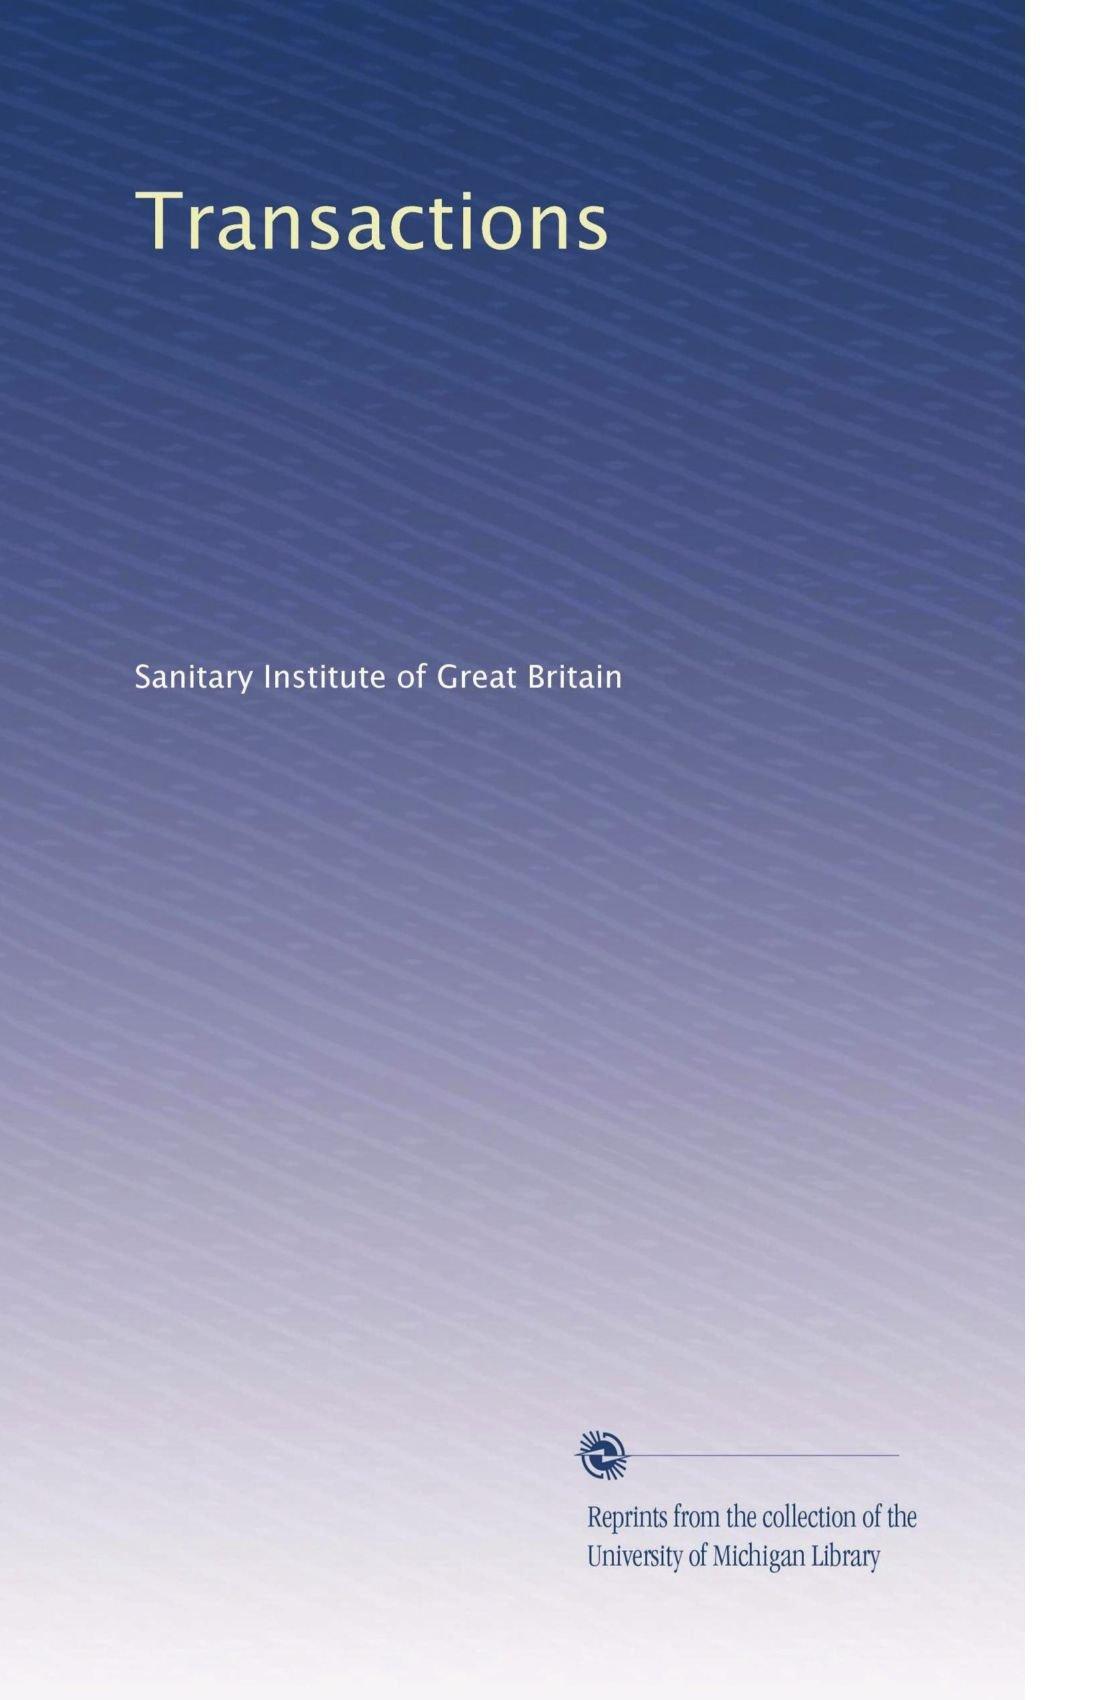 Download Transactions (Volume 7) ebook